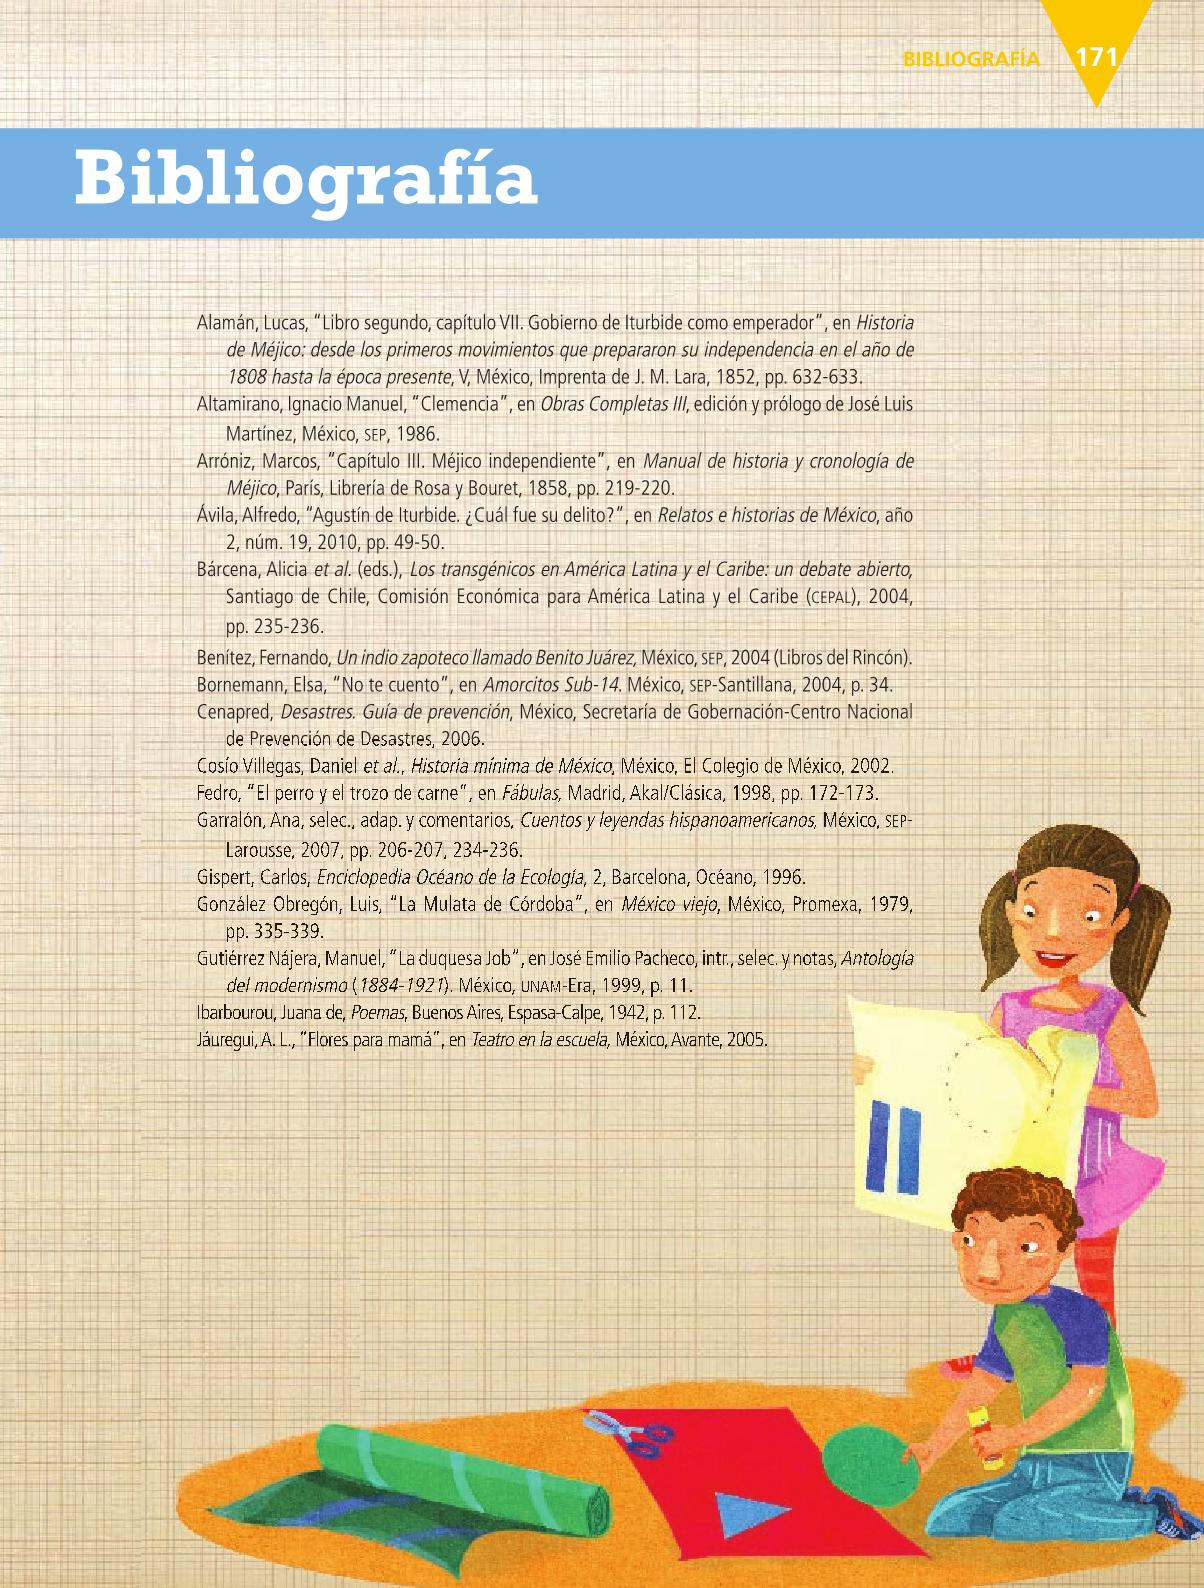 Español Libro para el alumnoquintoPagina 171